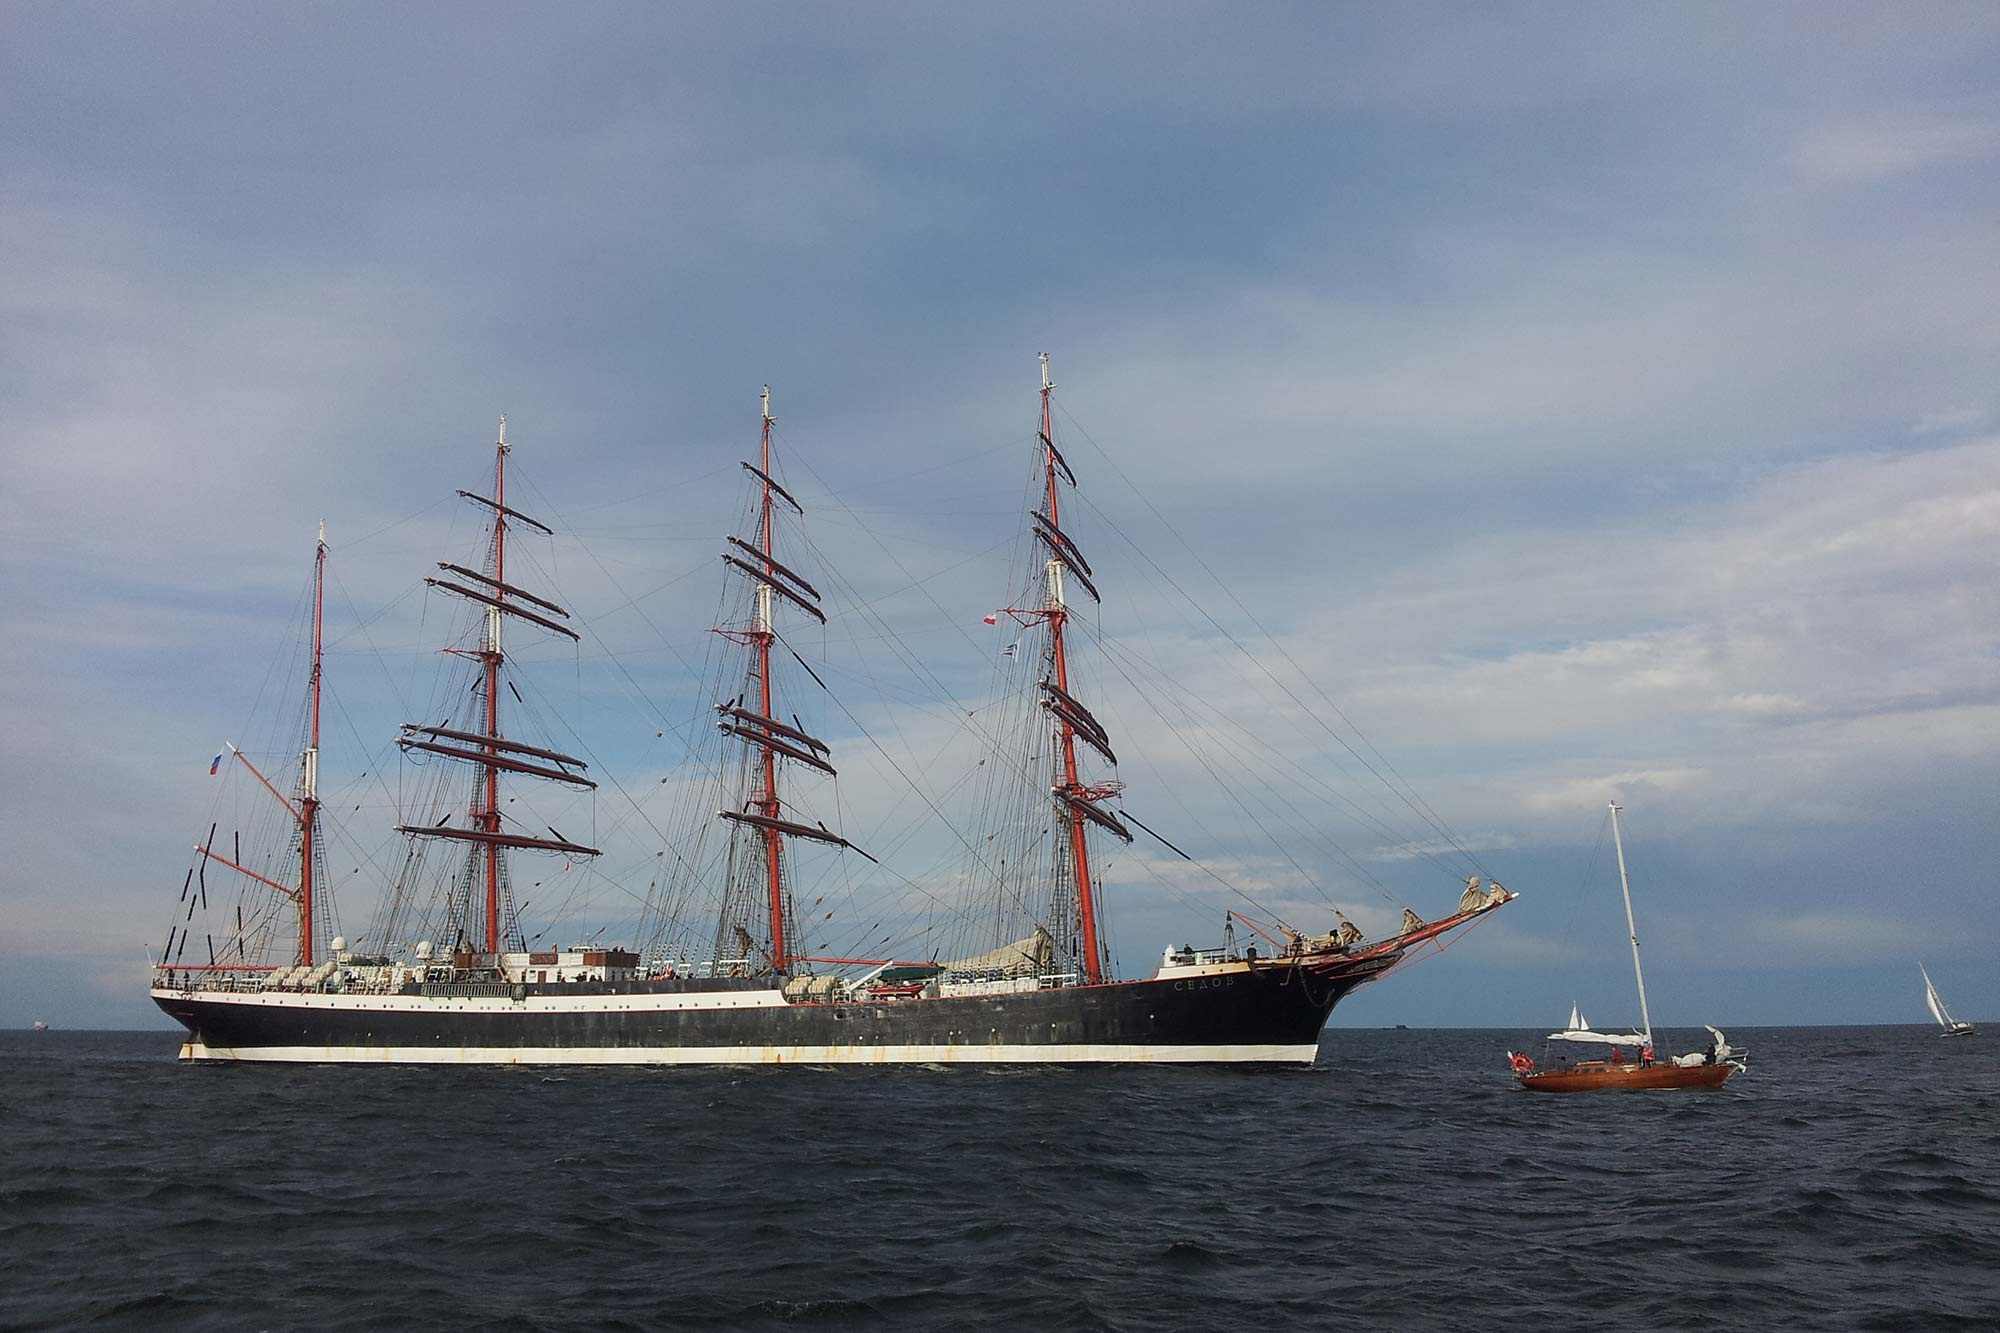 Gdynia Sails 2014